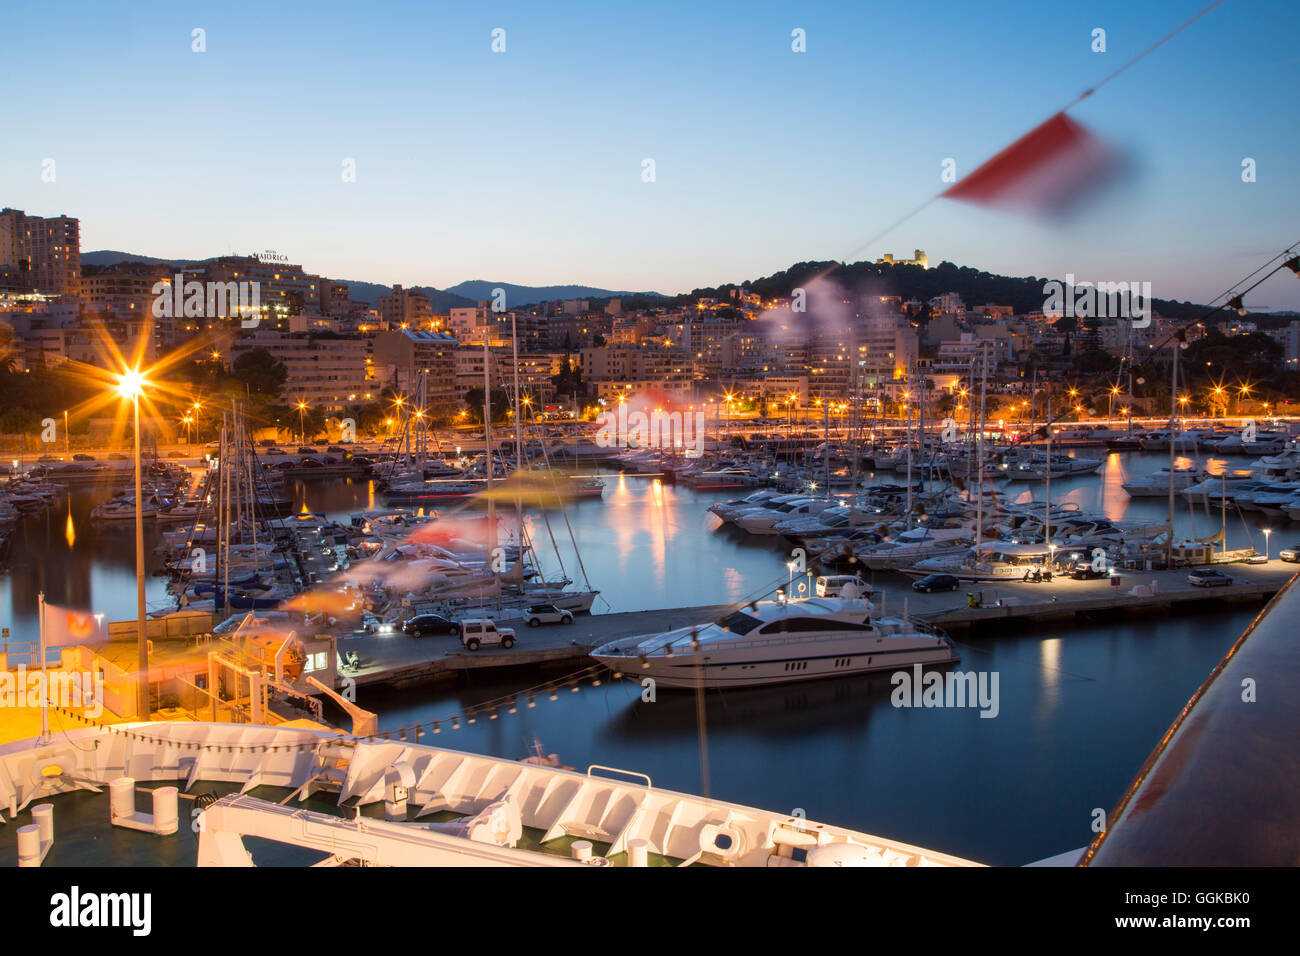 Bow of cruise ship MS Deutschland (Reederei Peter Deilmann) and sailing boats in the marina at dusk, Palma, Mallorca, - Stock Image